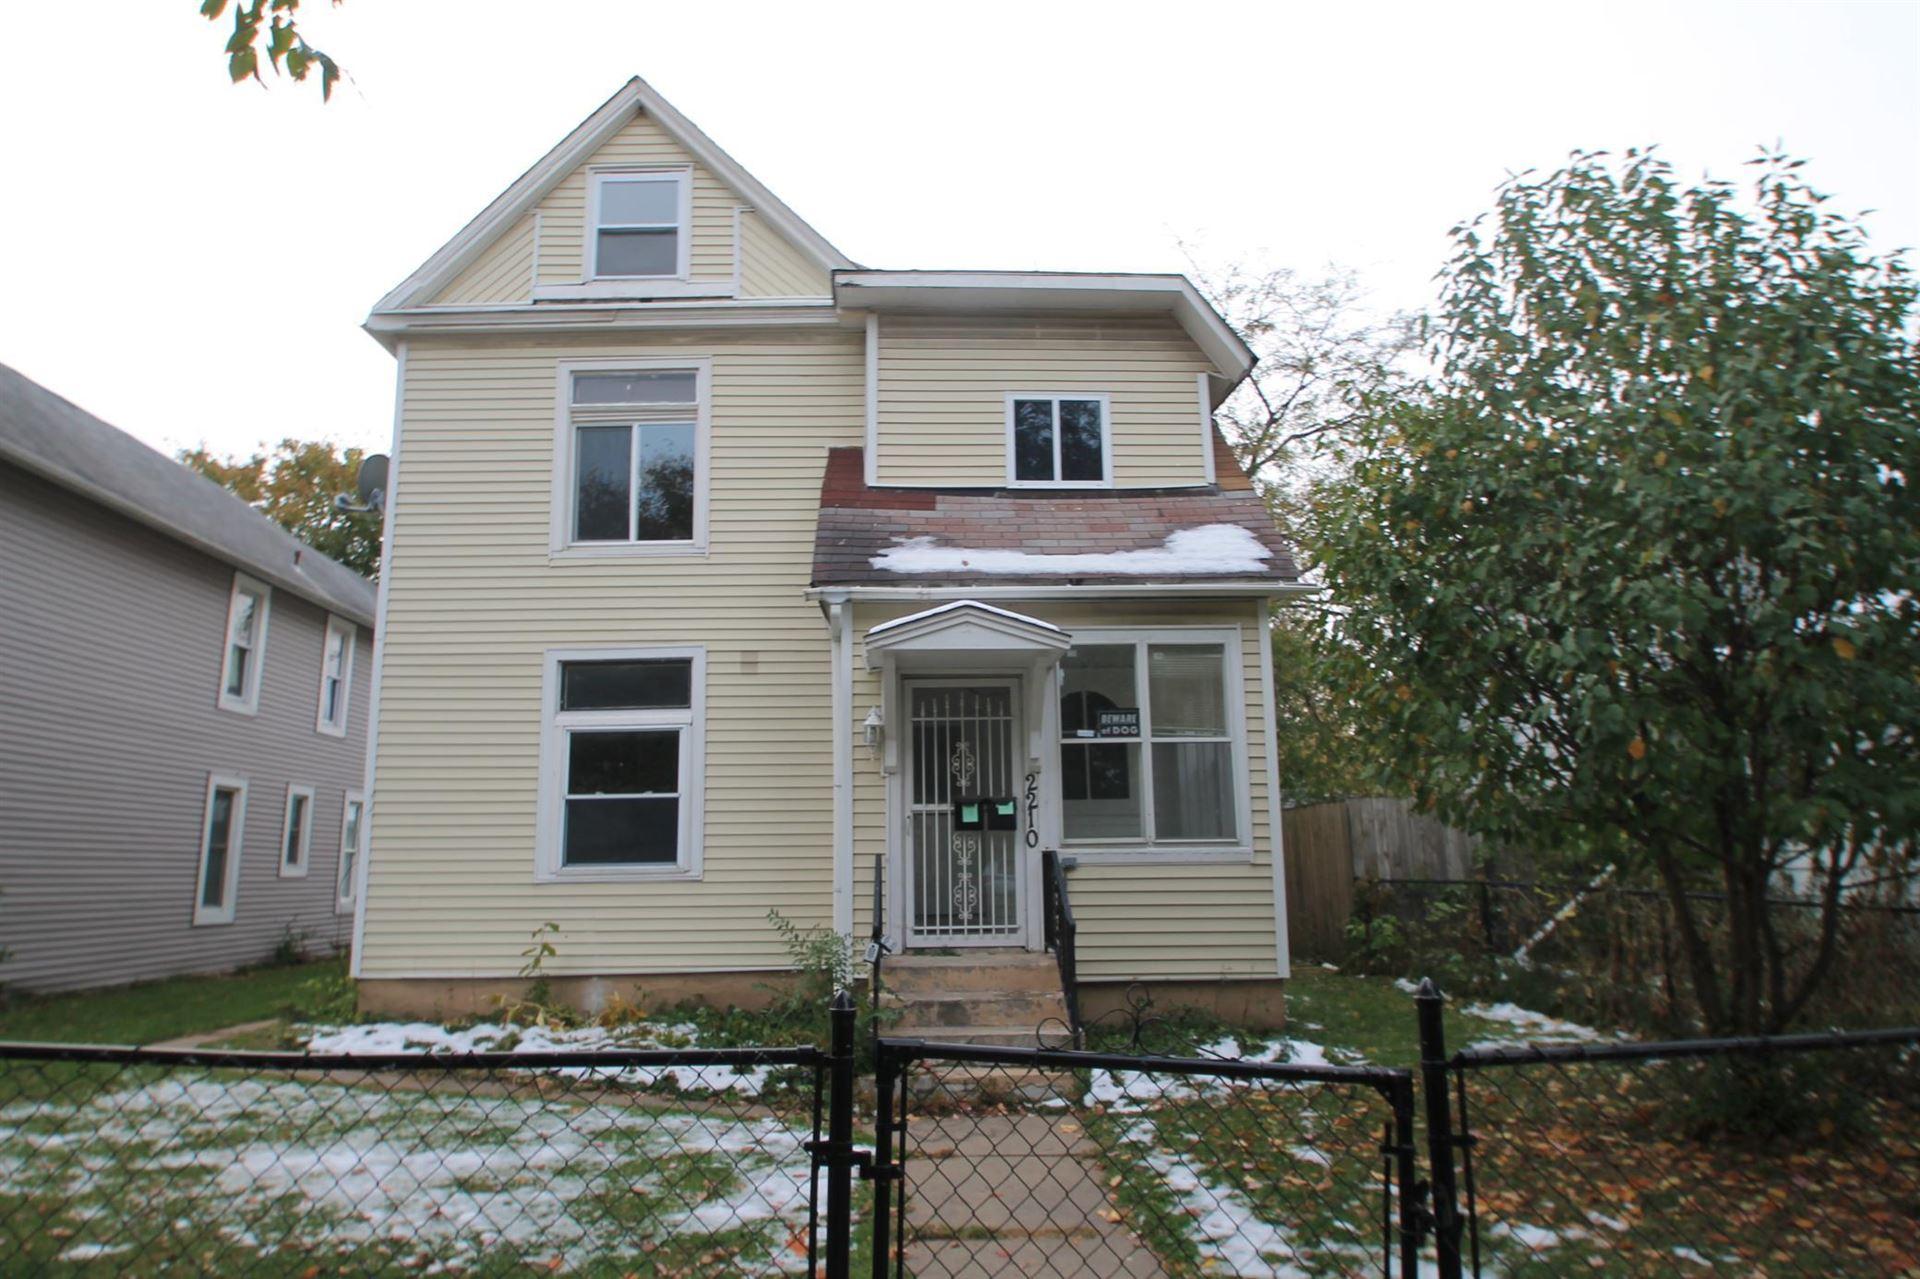 Photo of 2210 10th Avenue S #1, Minneapolis, MN 55404 (MLS # 5679699)